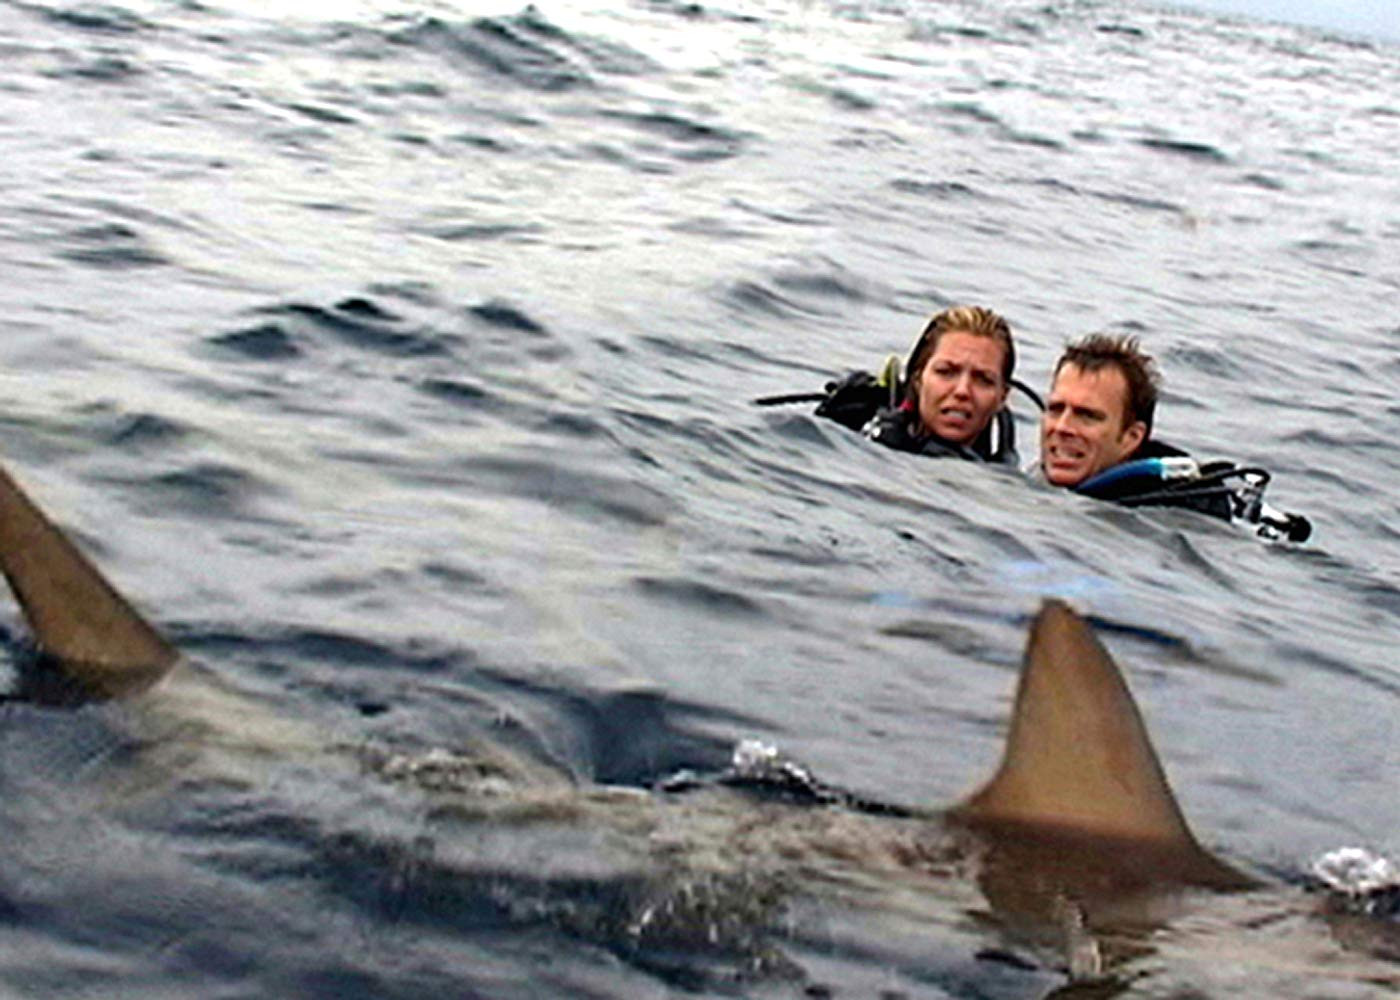 Blanchard Ryan and Daniel Travis stranded in a sea of sharks in Open Water (2003)